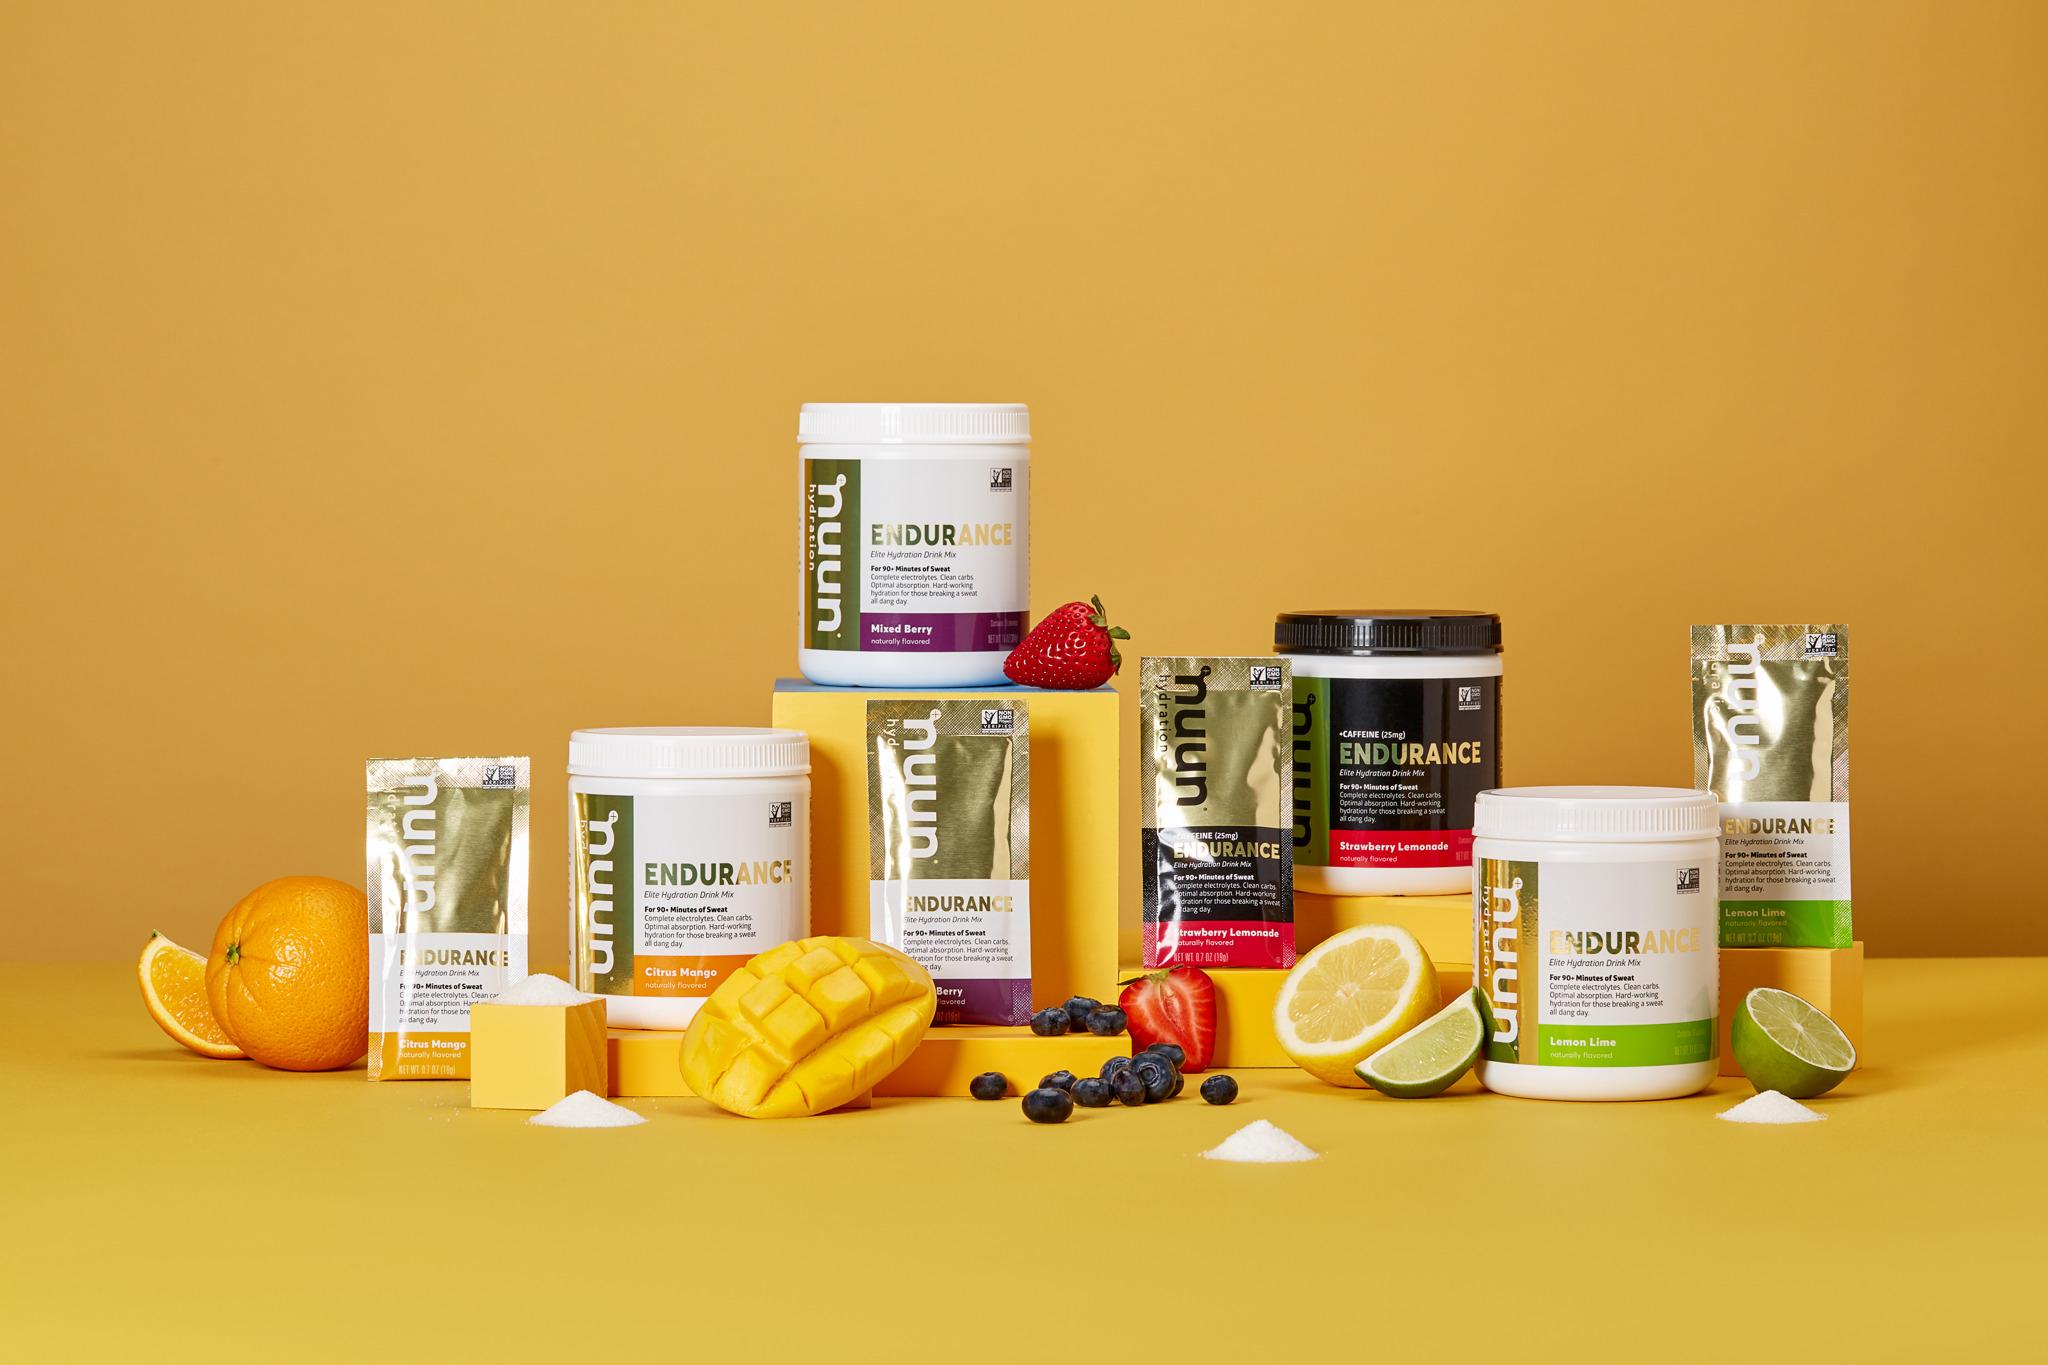 Carbs Nuun Hydration Performance Drink Mix Mango Orange 12 Sachets Electrolytes